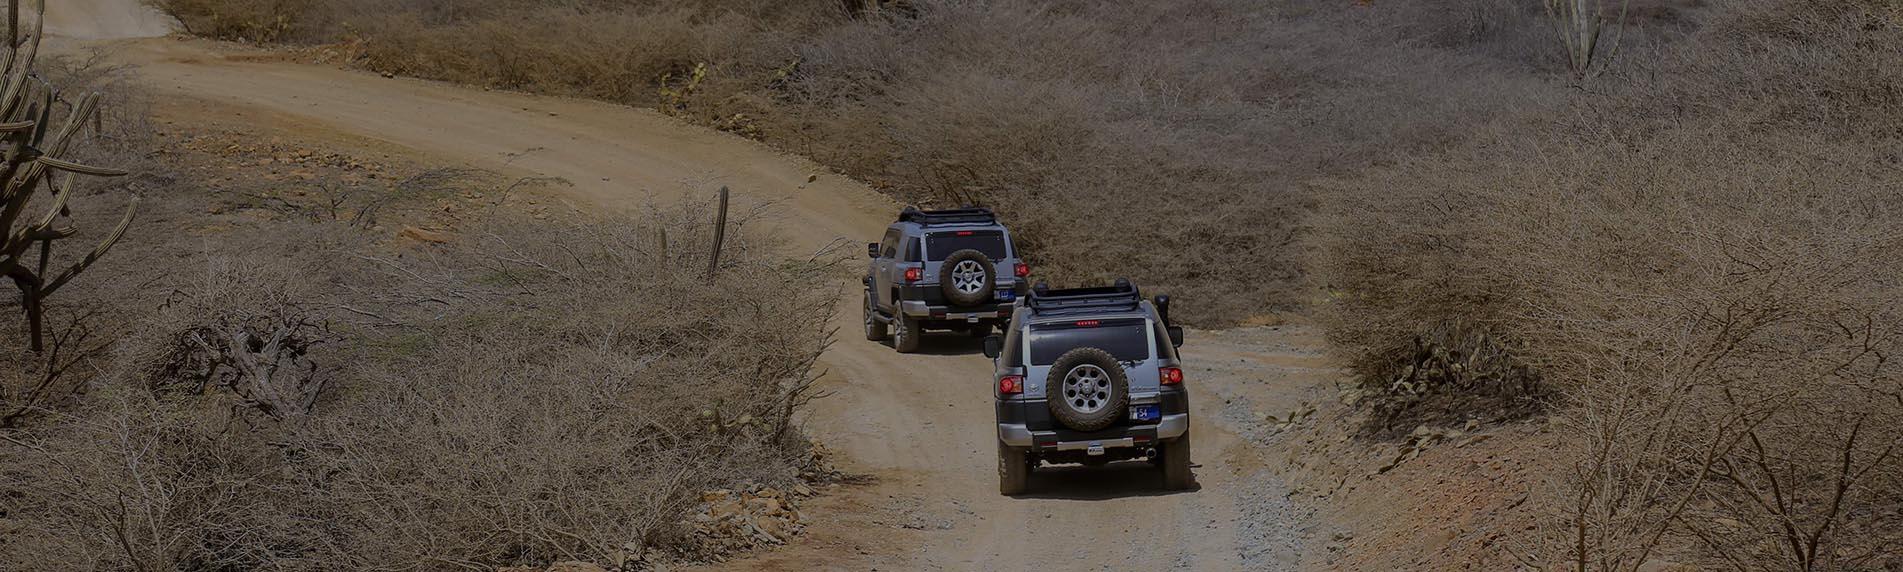 Aruba Off-Road Jeep Tours in Aruba